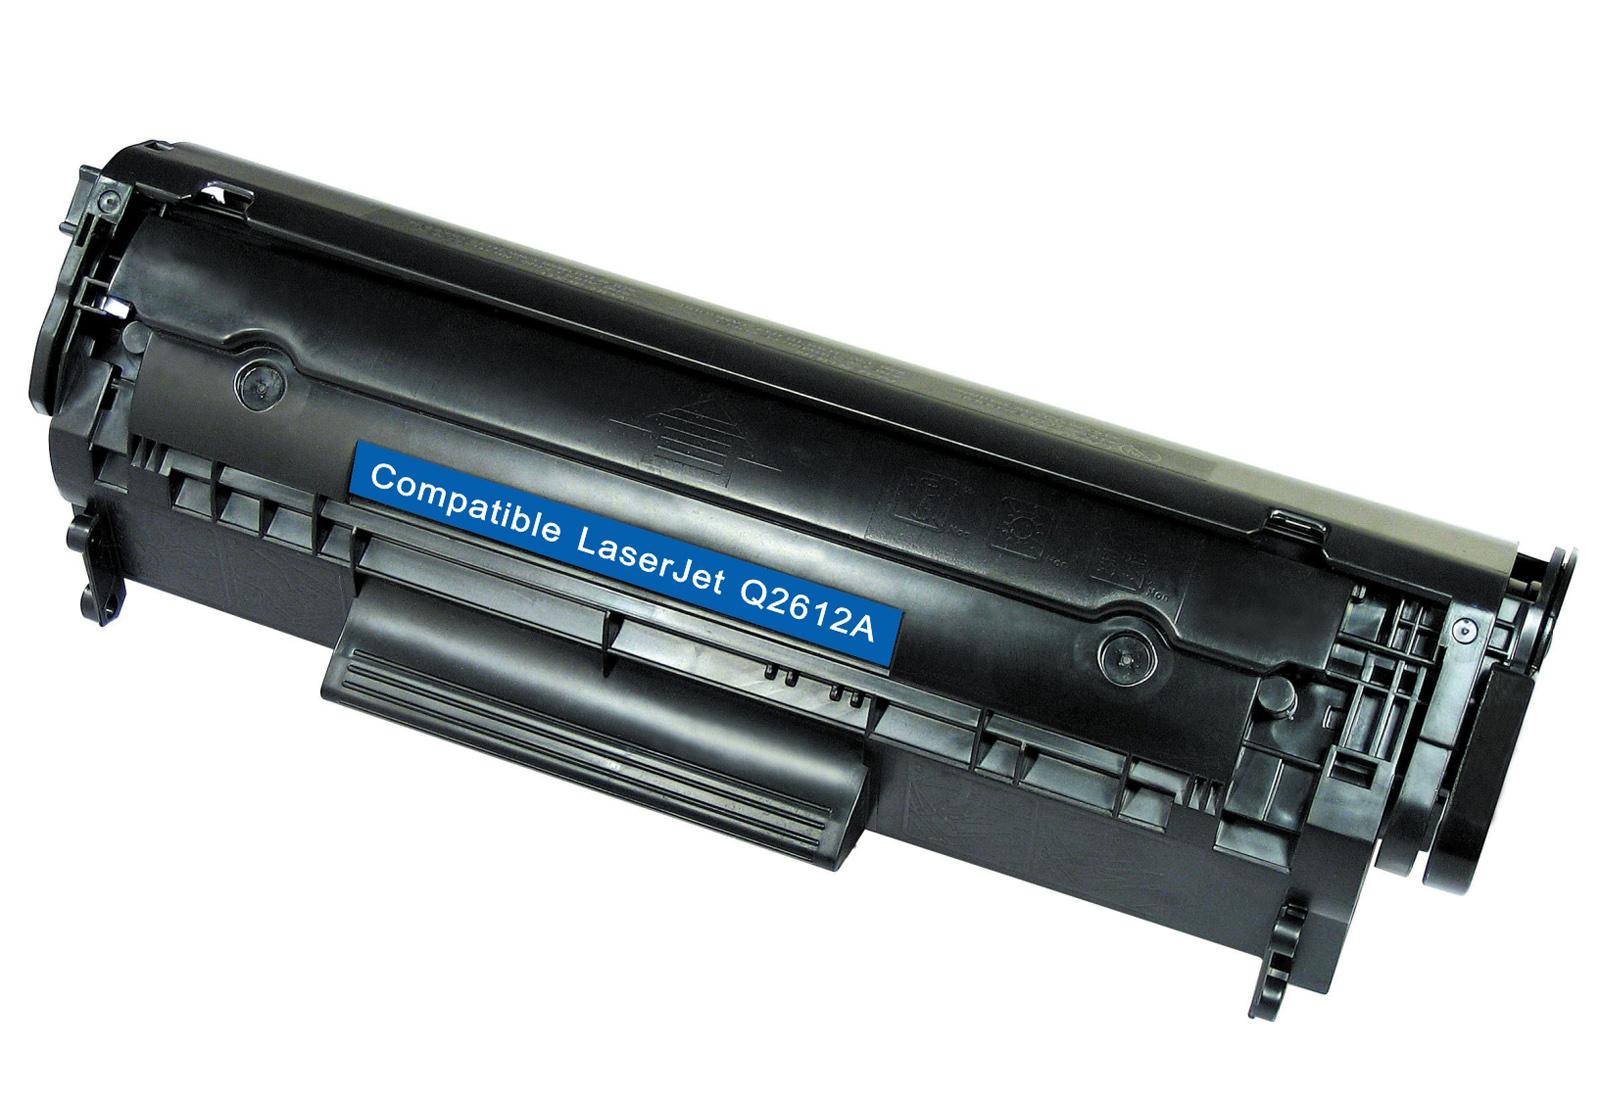 Q2612a 12a Black Toner Cartridge For Hp Laserjet 3015 3020